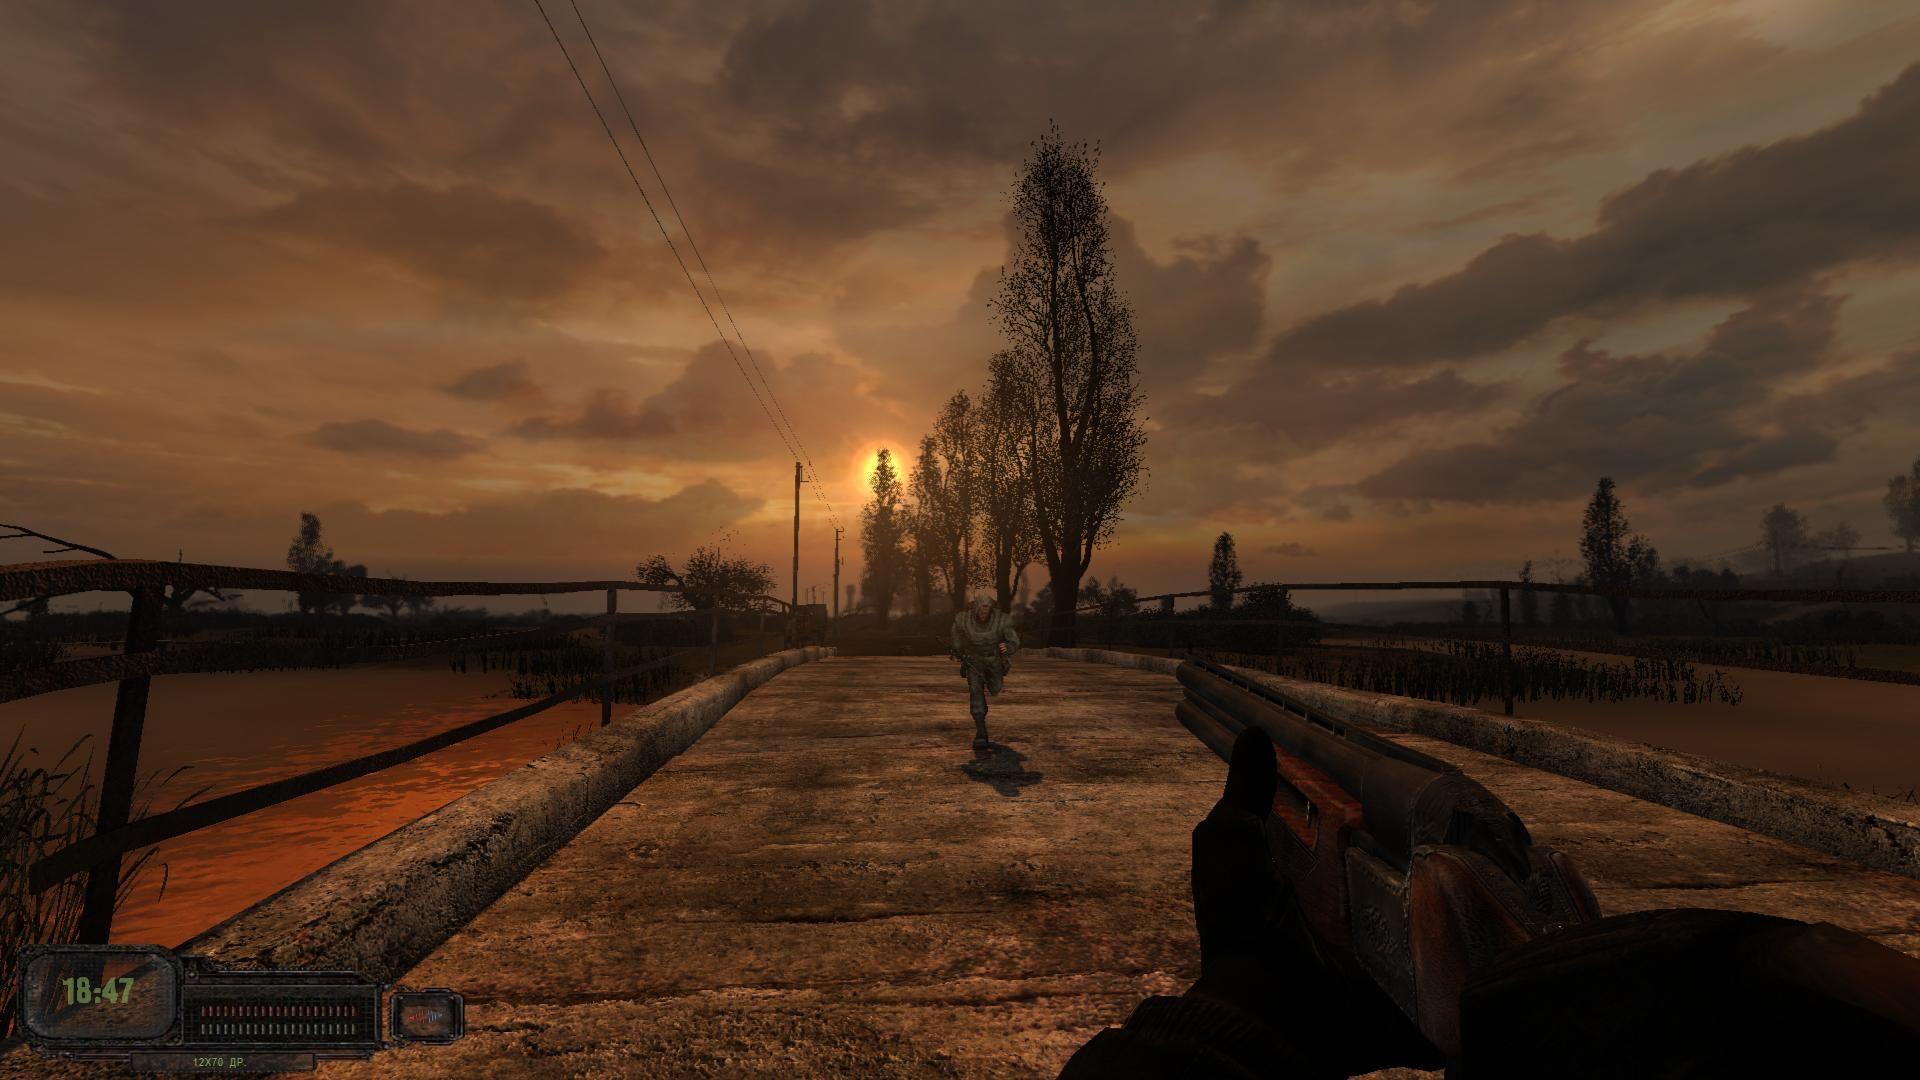 S.T.A.L.K.E.R.: Shadow of Chernobyl - Вариант Омега 2. Холодное лето 2014-го [v1.1] (2018/PC/Русский), Repack от SeregA-Lus